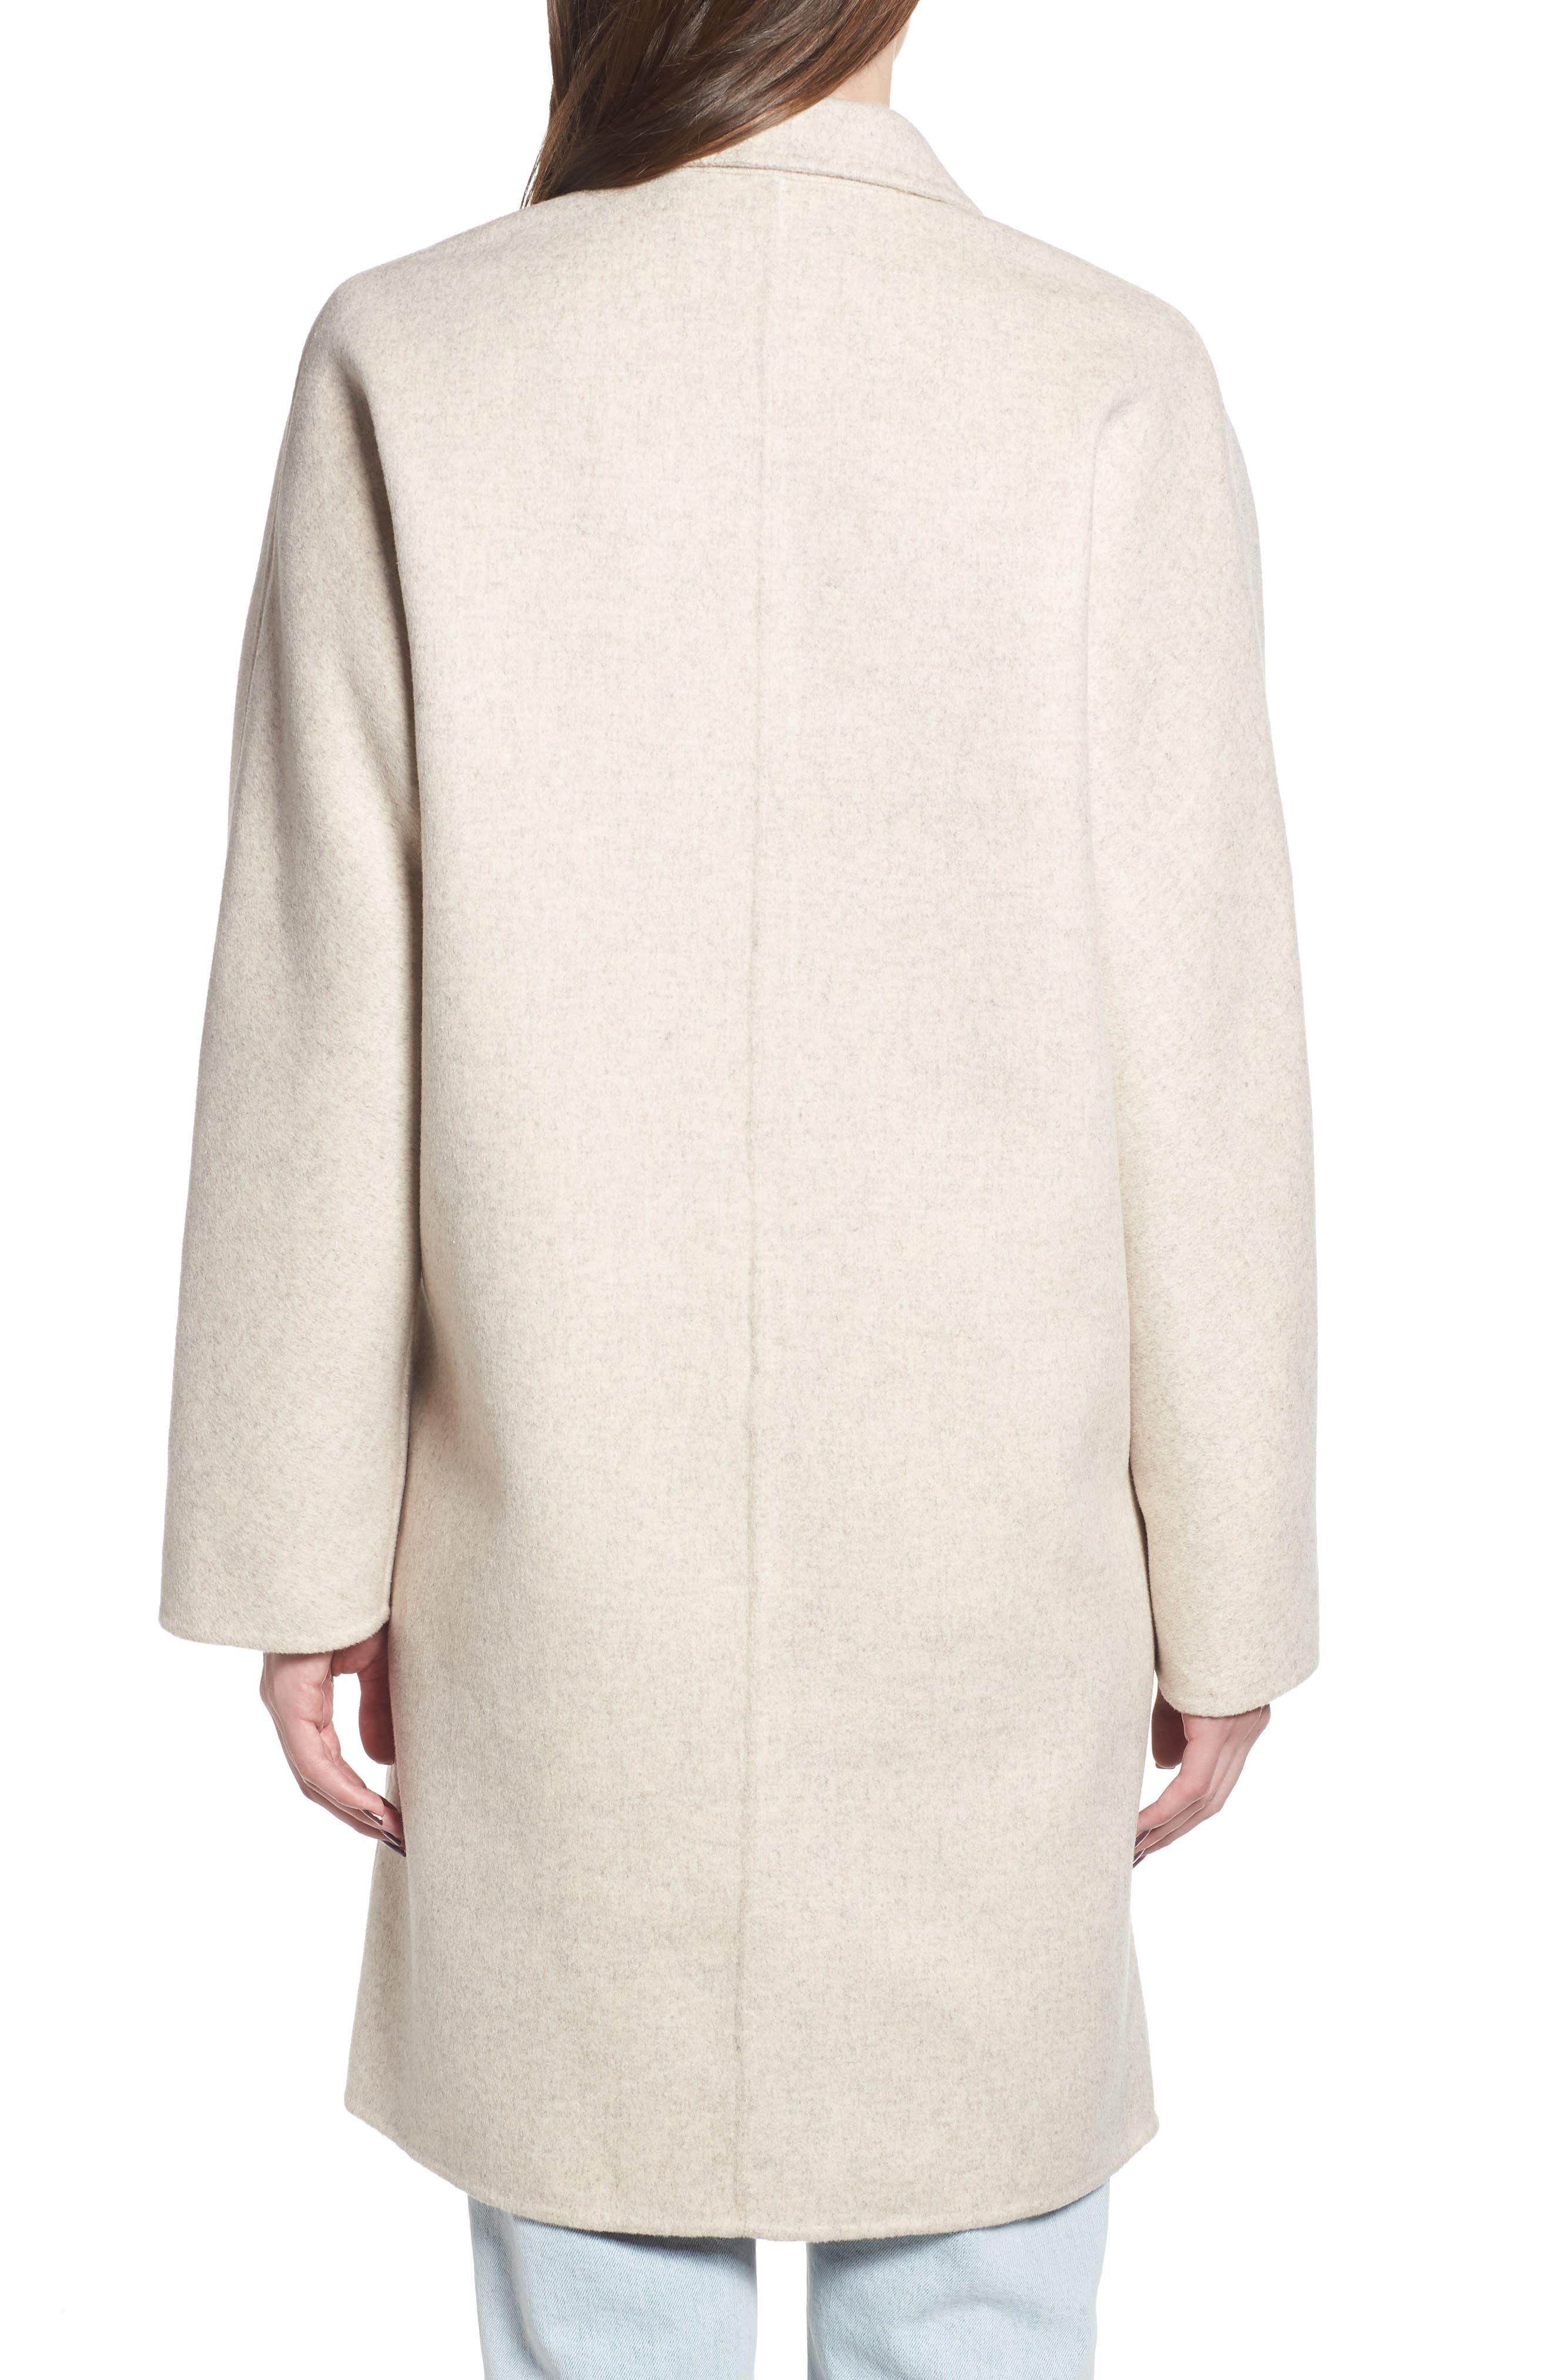 Everest Wool Blend Coat,                             Alternate thumbnail 3, color,                             OATMEAL